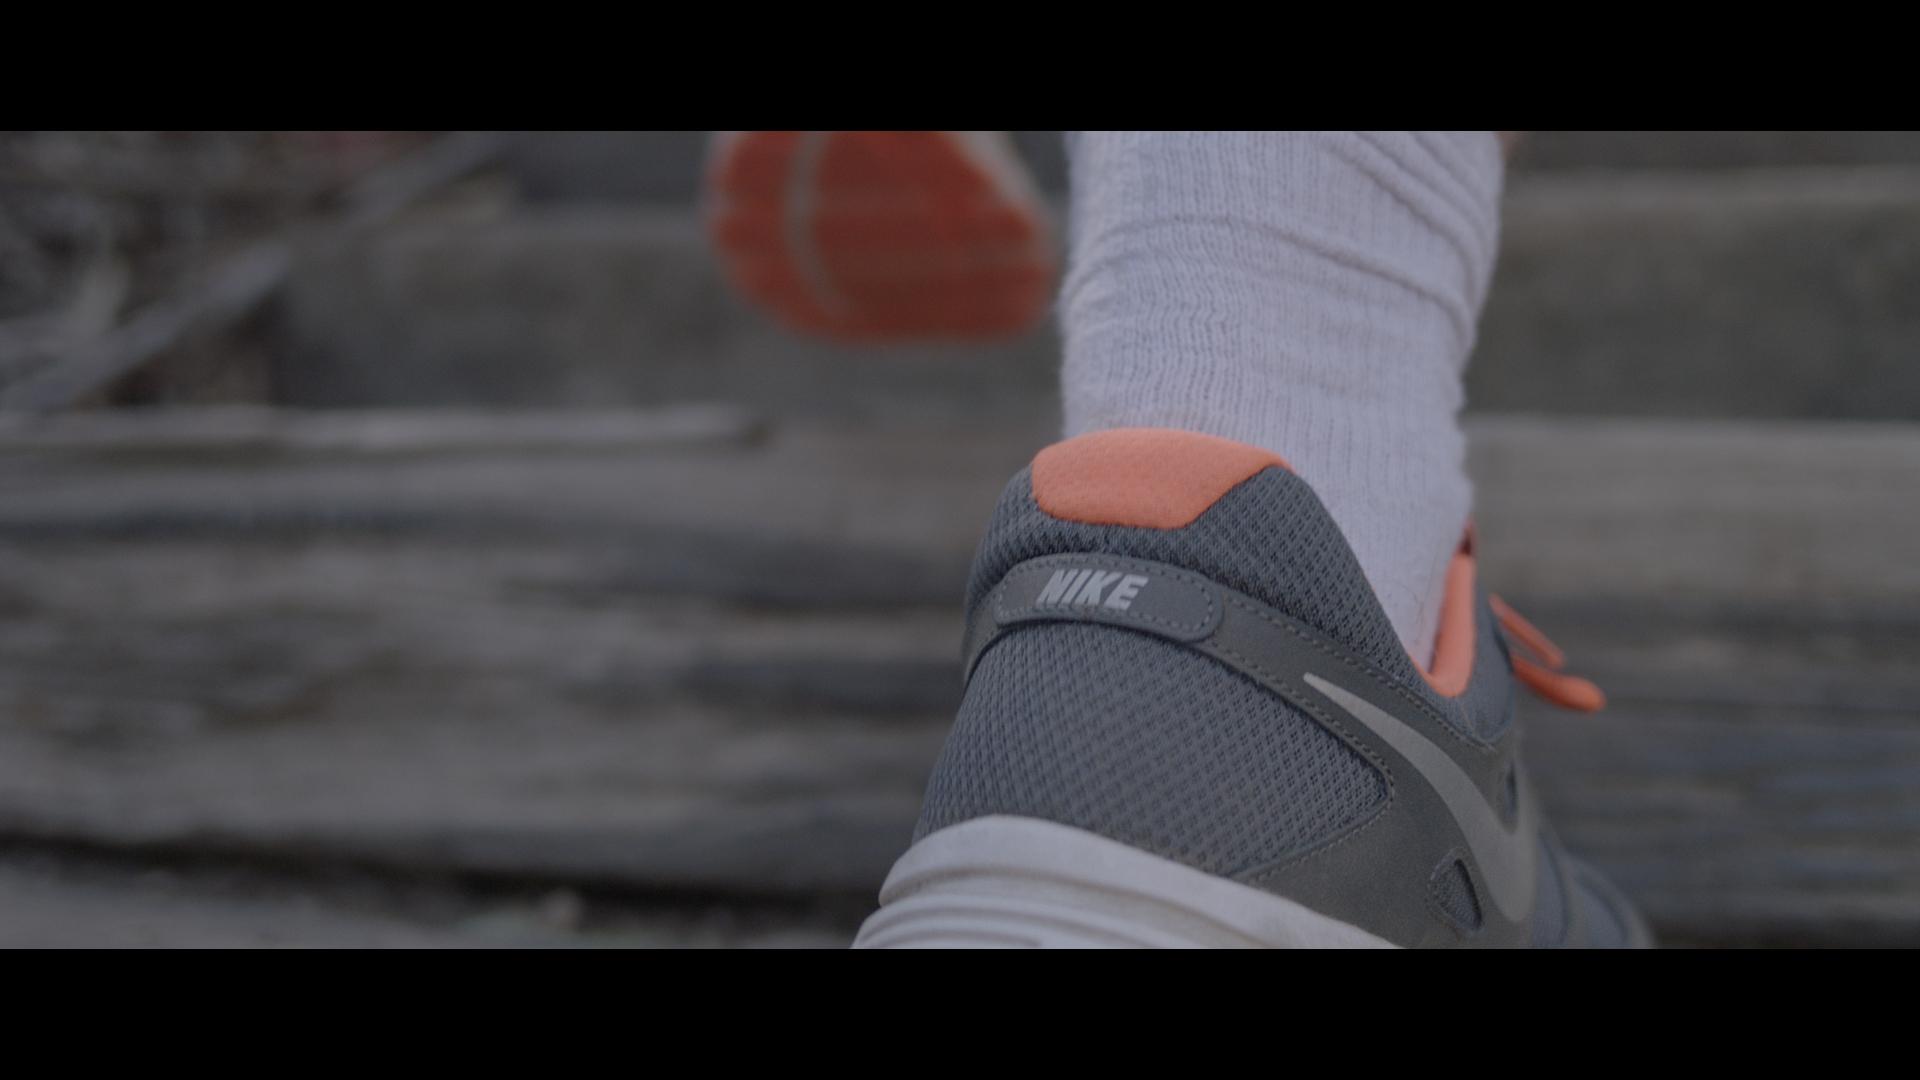 NikeSpecSTL_1.72.1.jpg